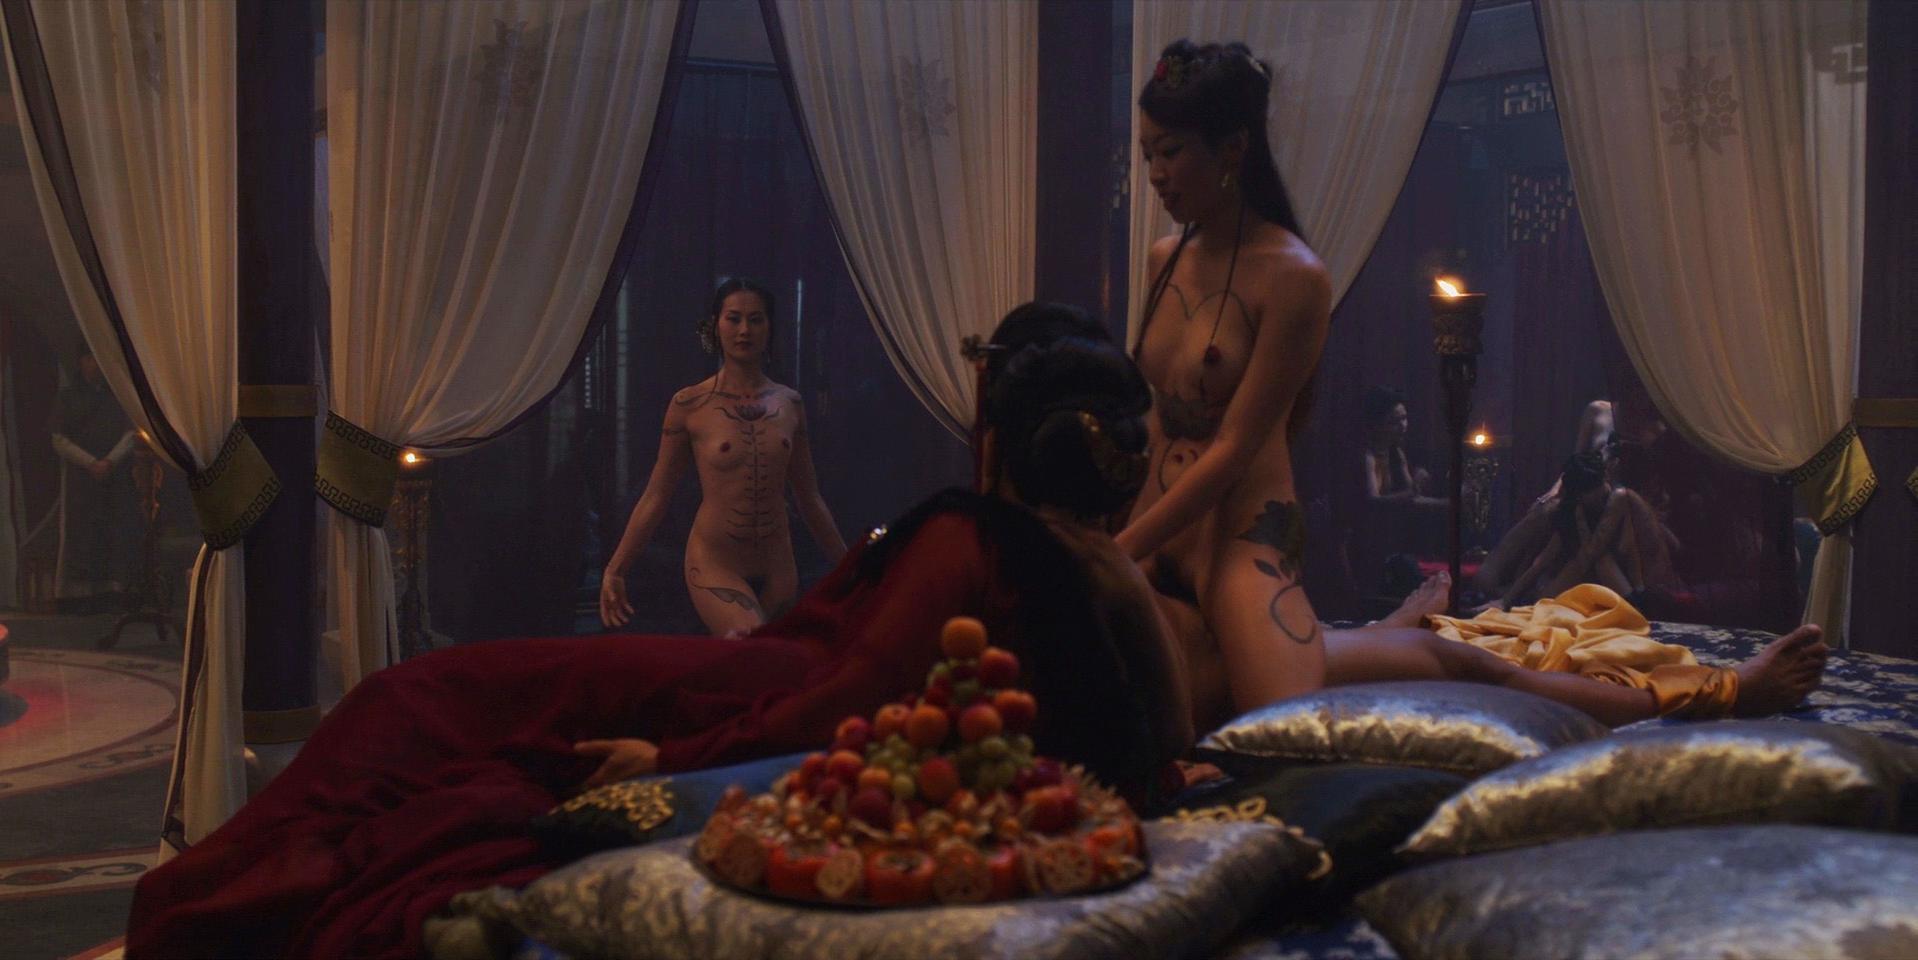 Ang Naked nude video celebs » actress » leifennie ang